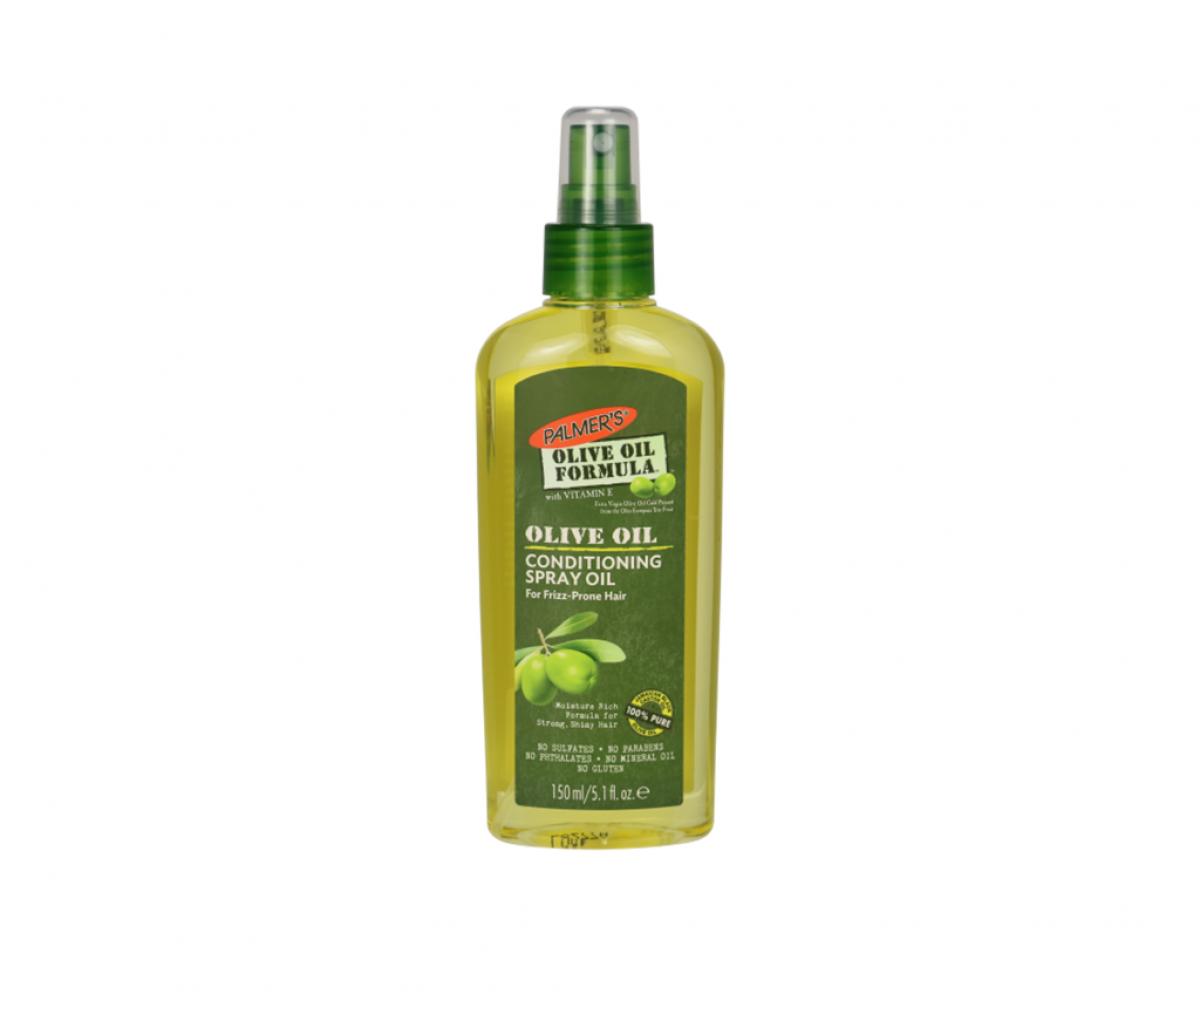 Palmers Olive Oil Formula Spray Oil